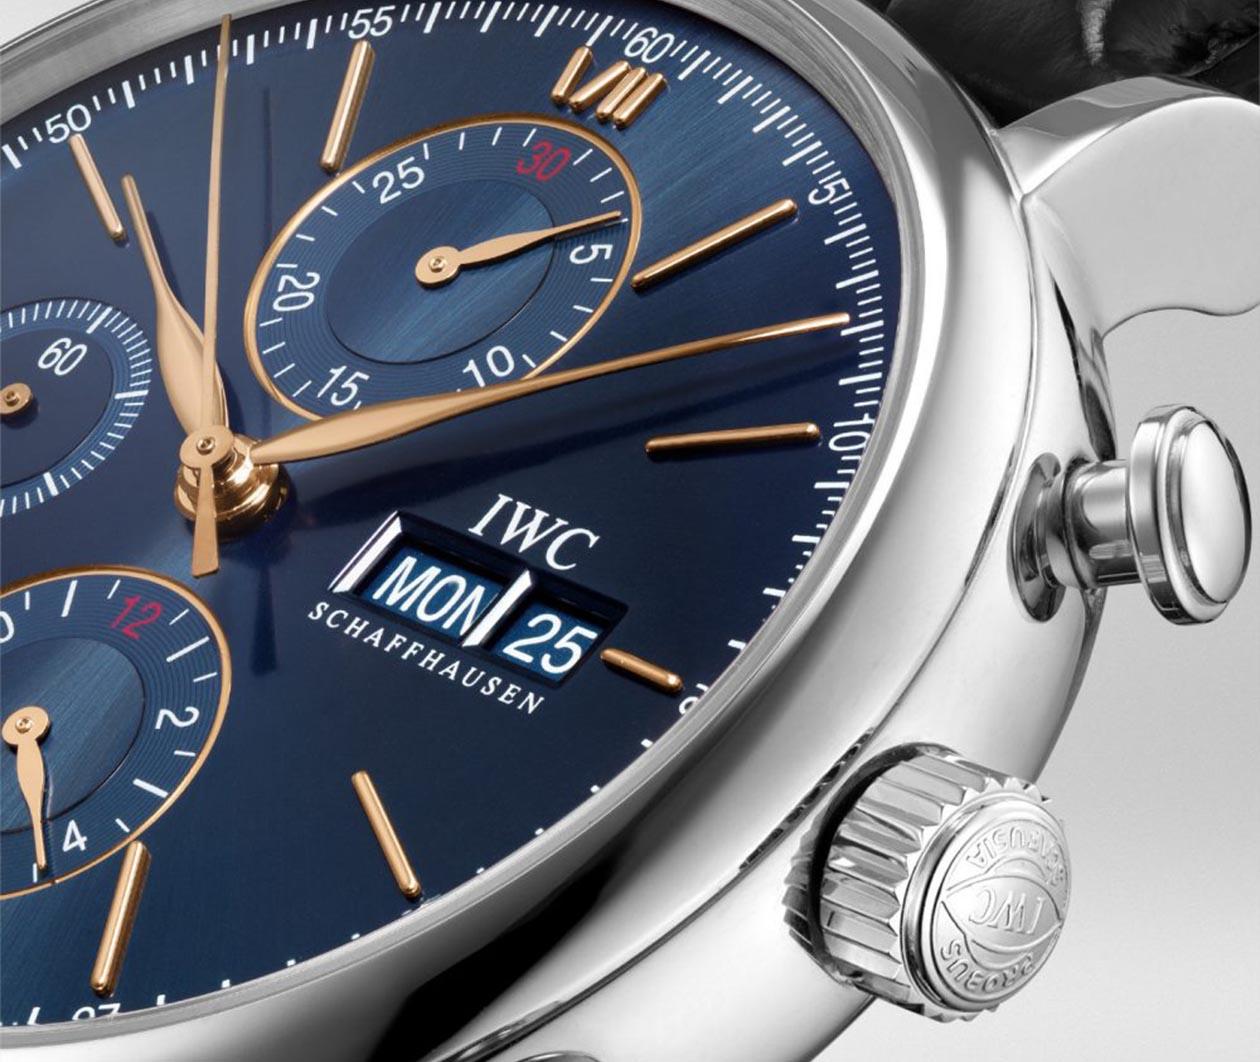 IWC Portofino Chronograph IW391036 Carousel 3 FINAL